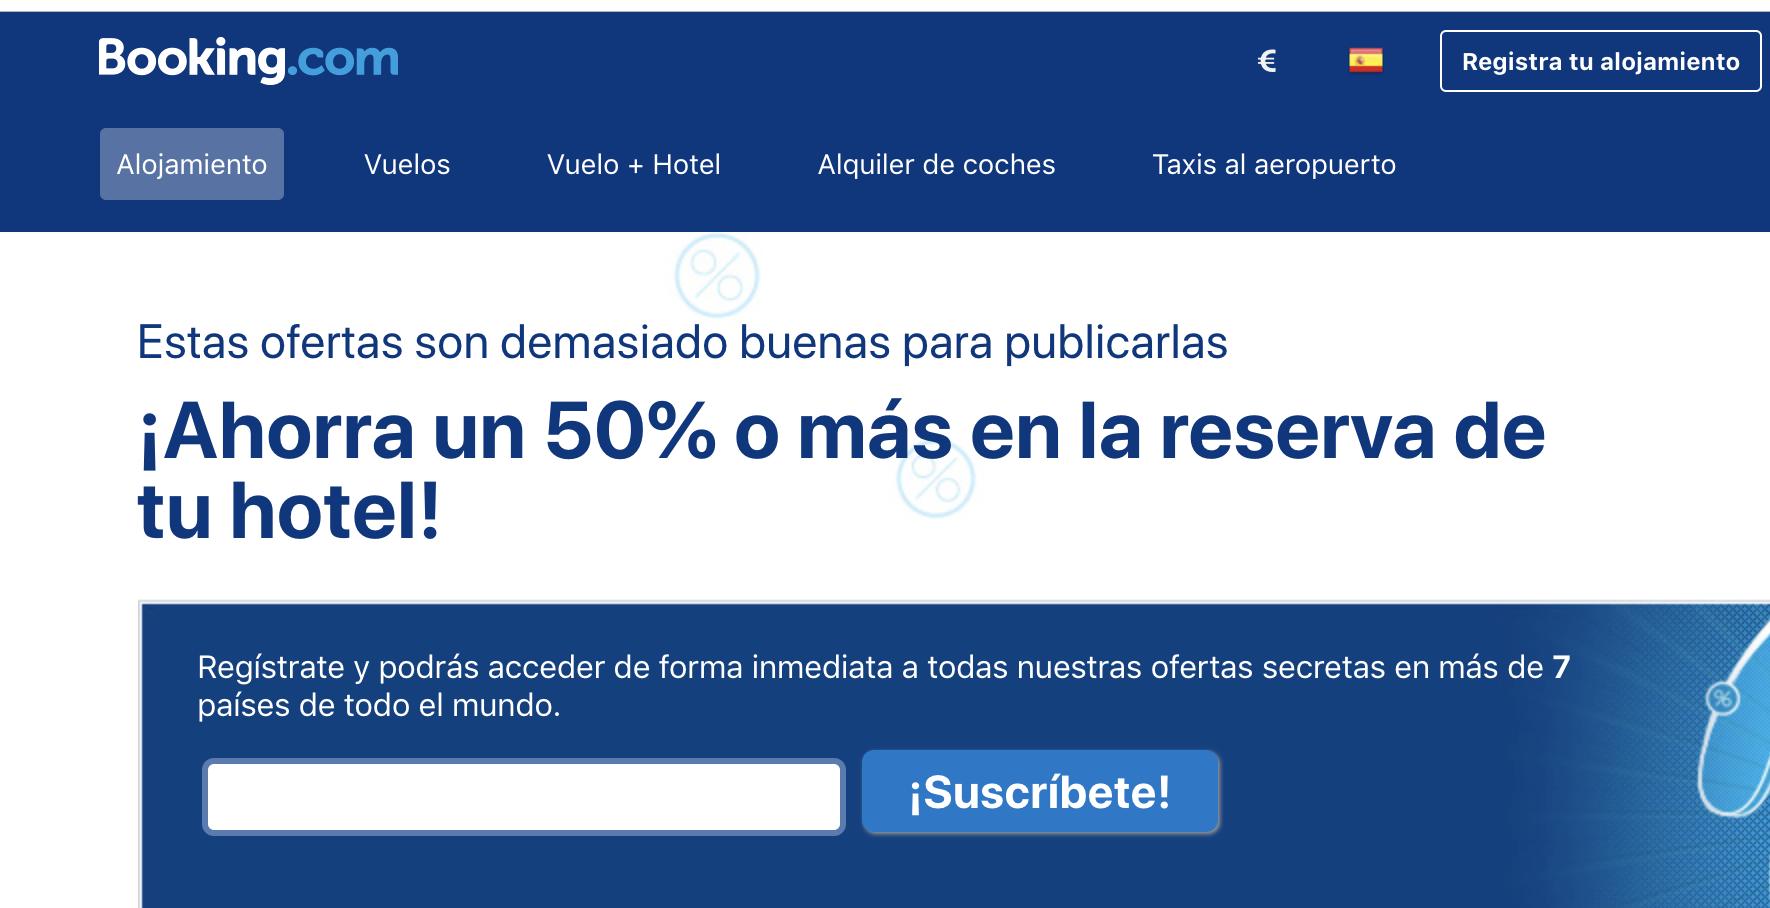 booking.com como campaña de marketing para Black Friday